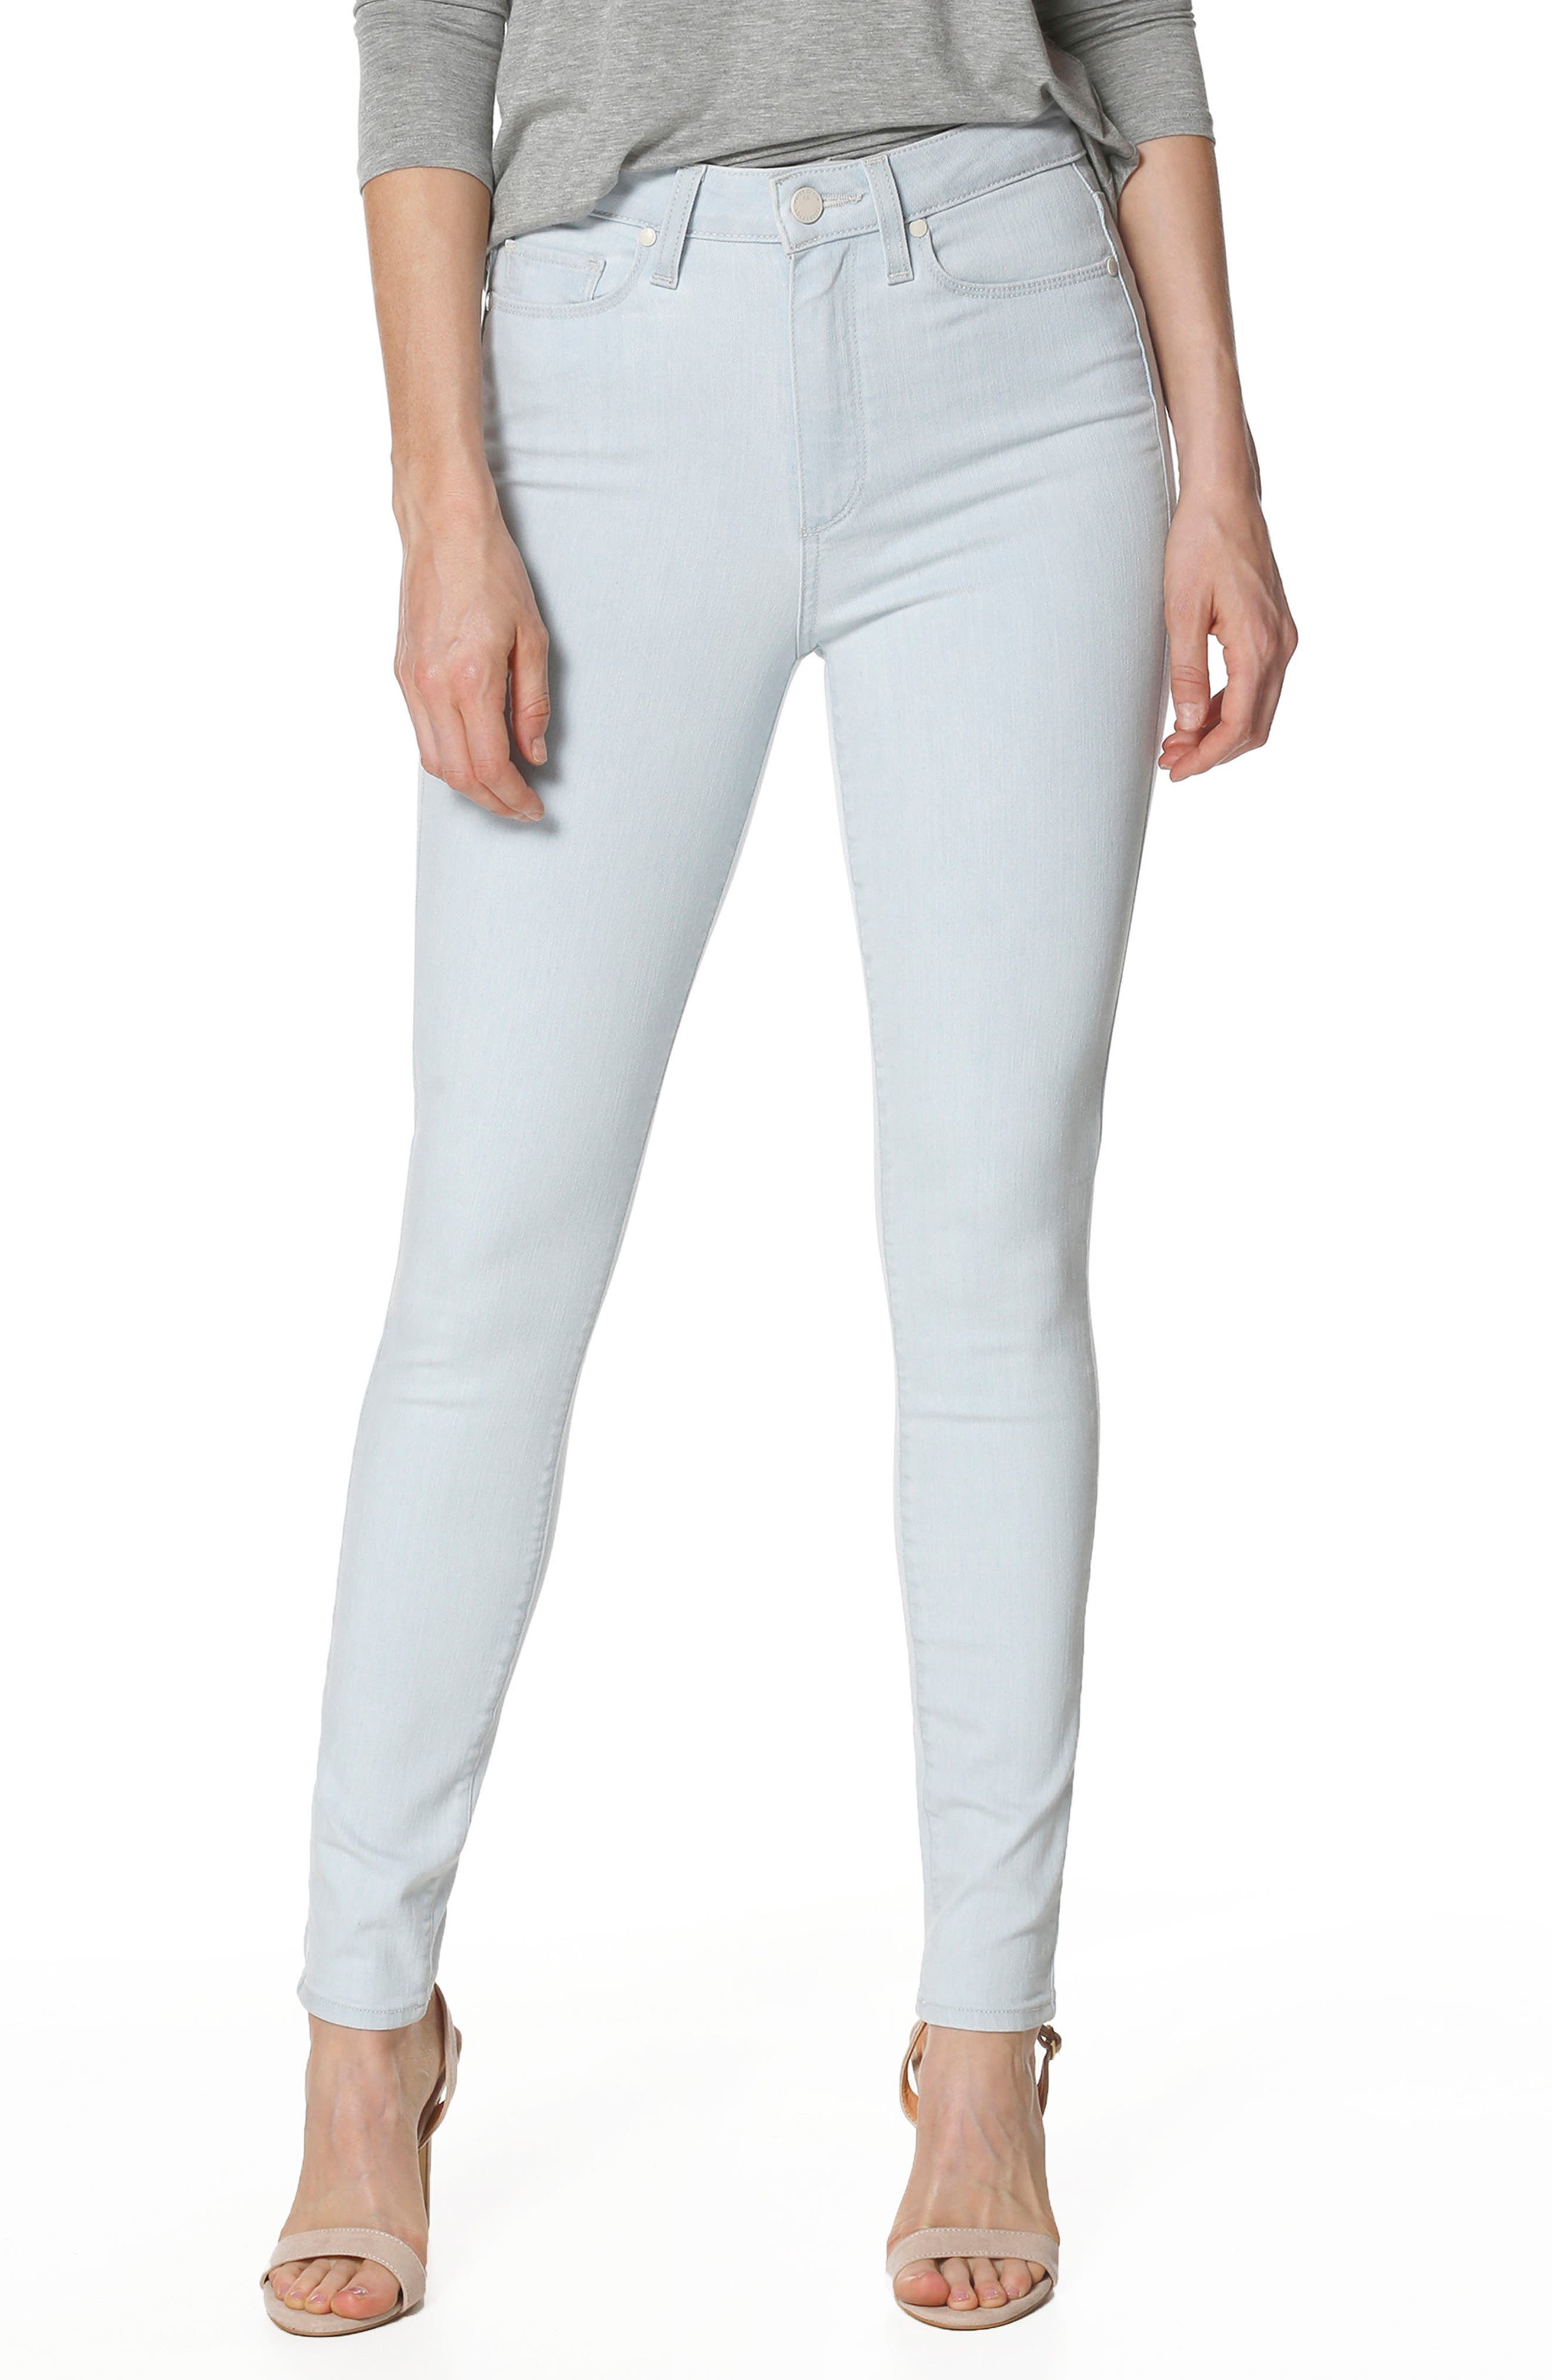 Margot High Waist Ultra Skinny Jeans,                         Main,                         color, 400